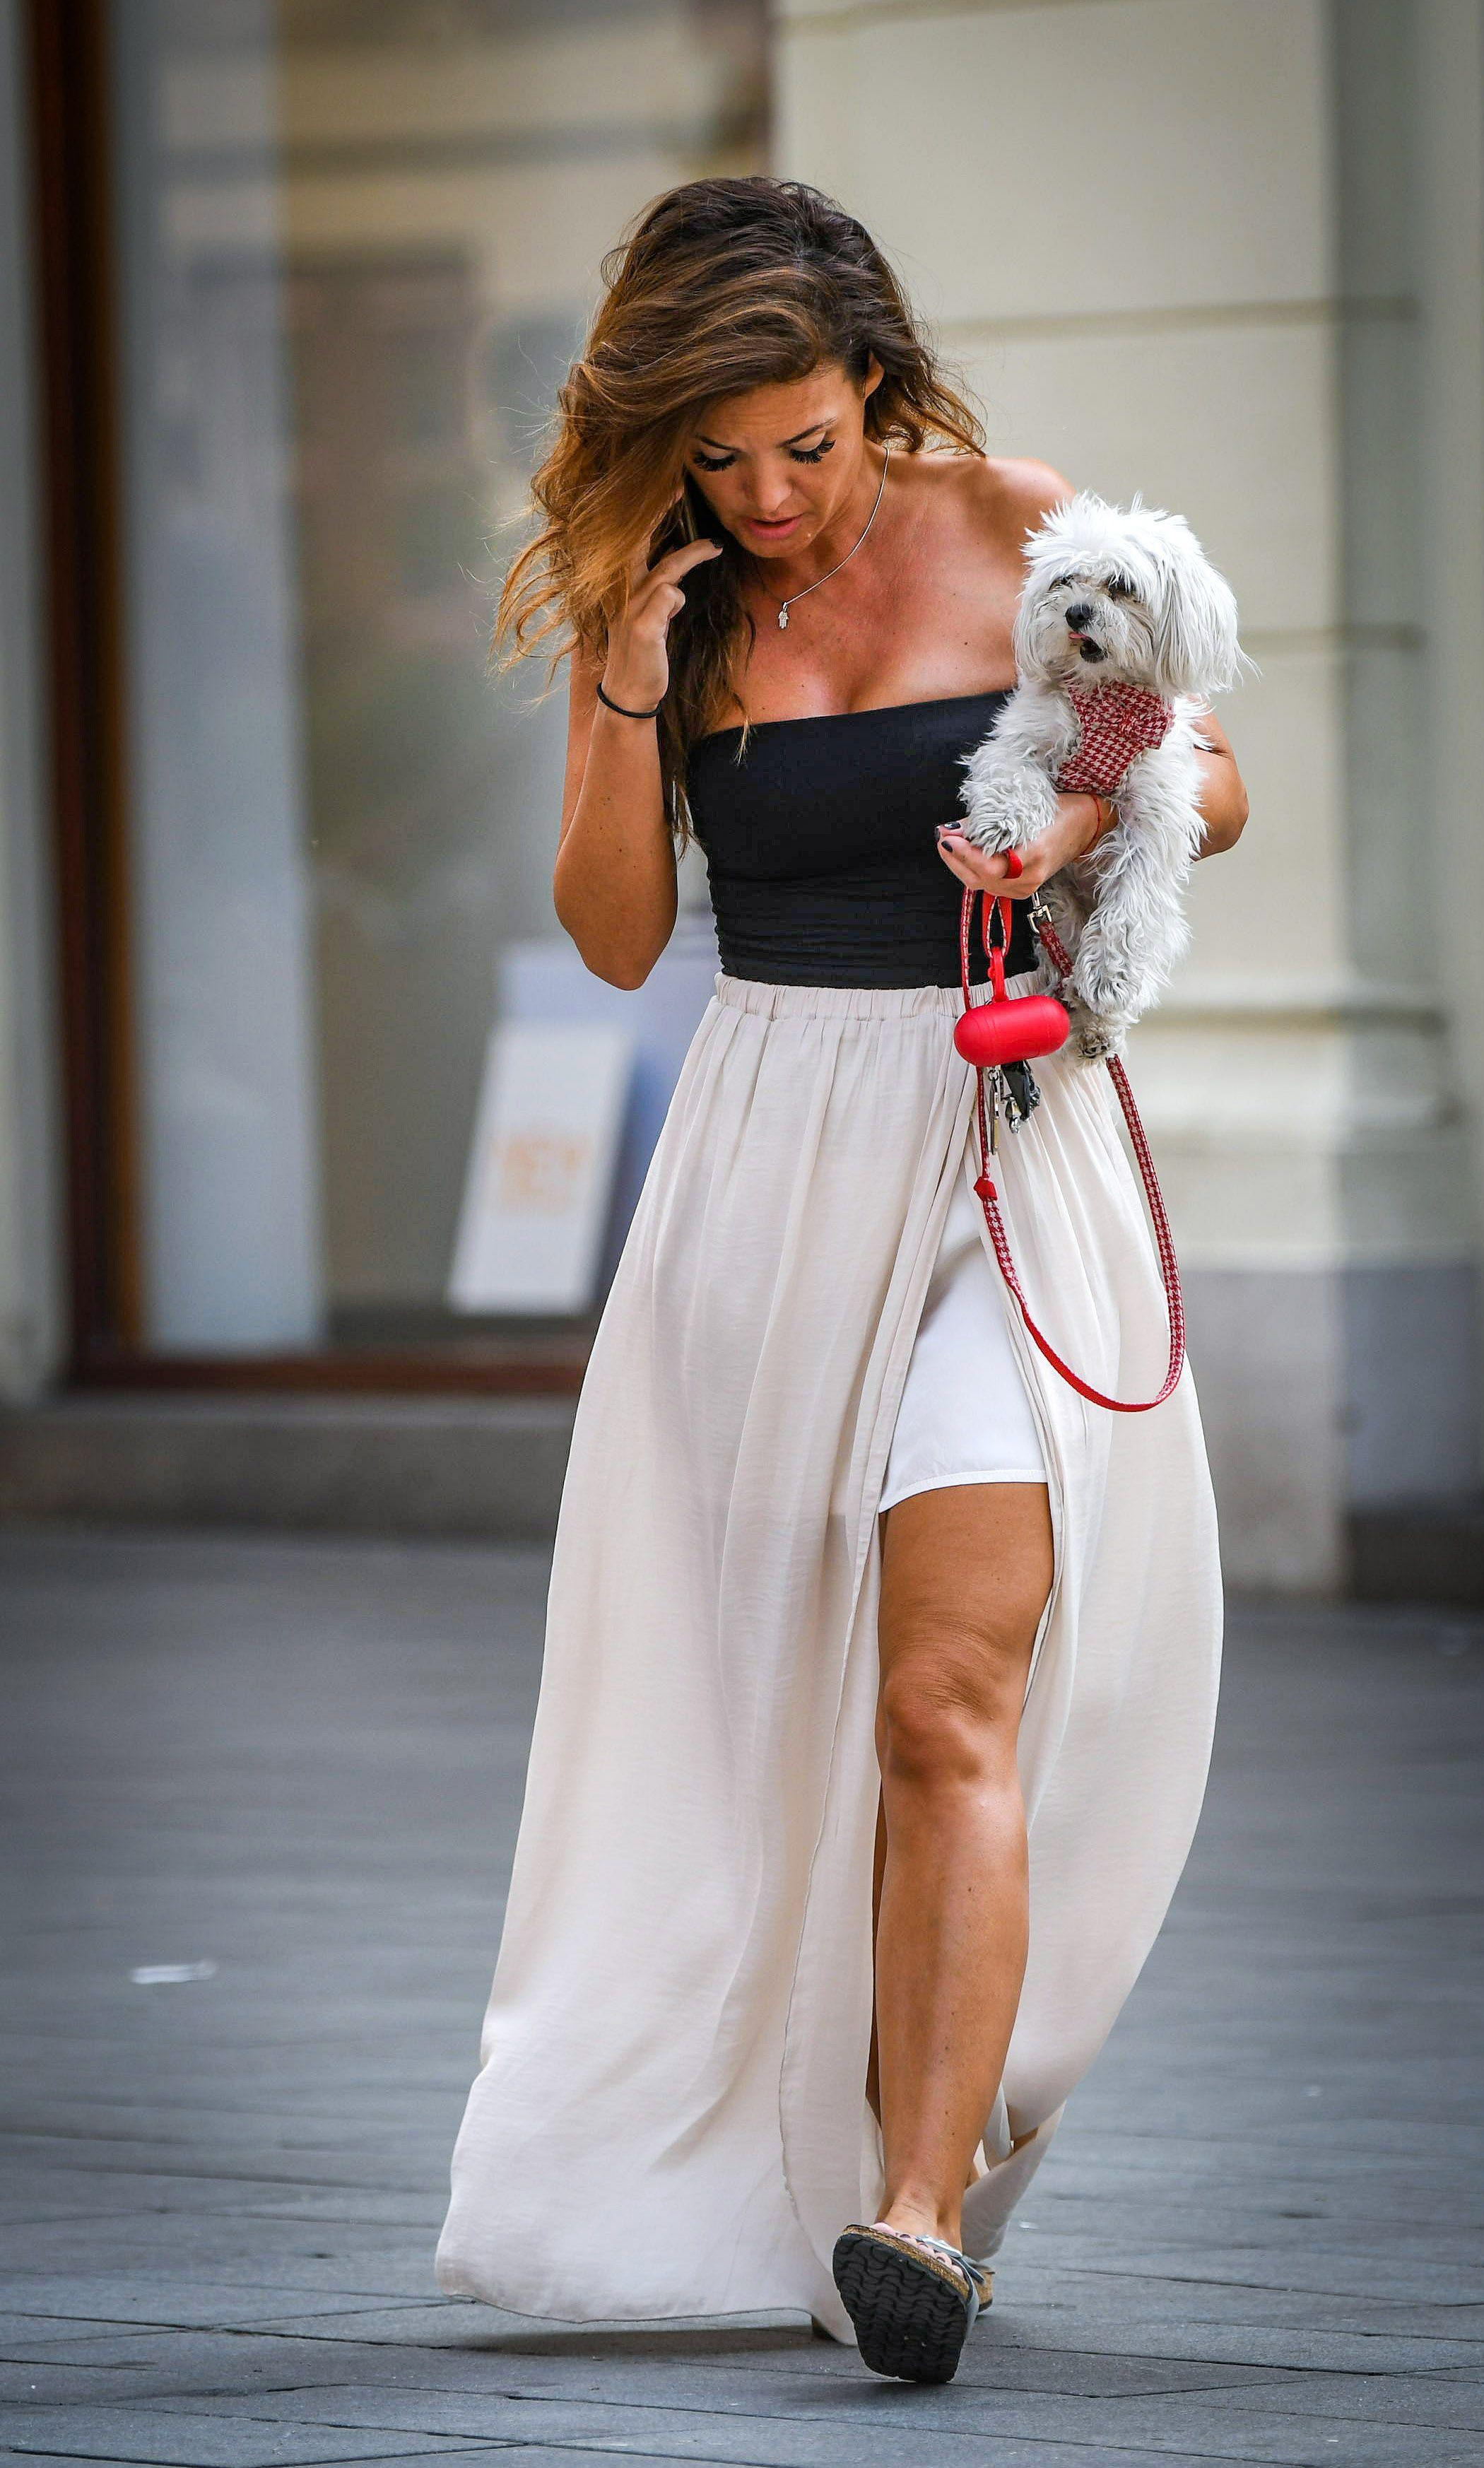 Atraktivna dama iz centra Zagreba i njen psić prave su zvijezde špice